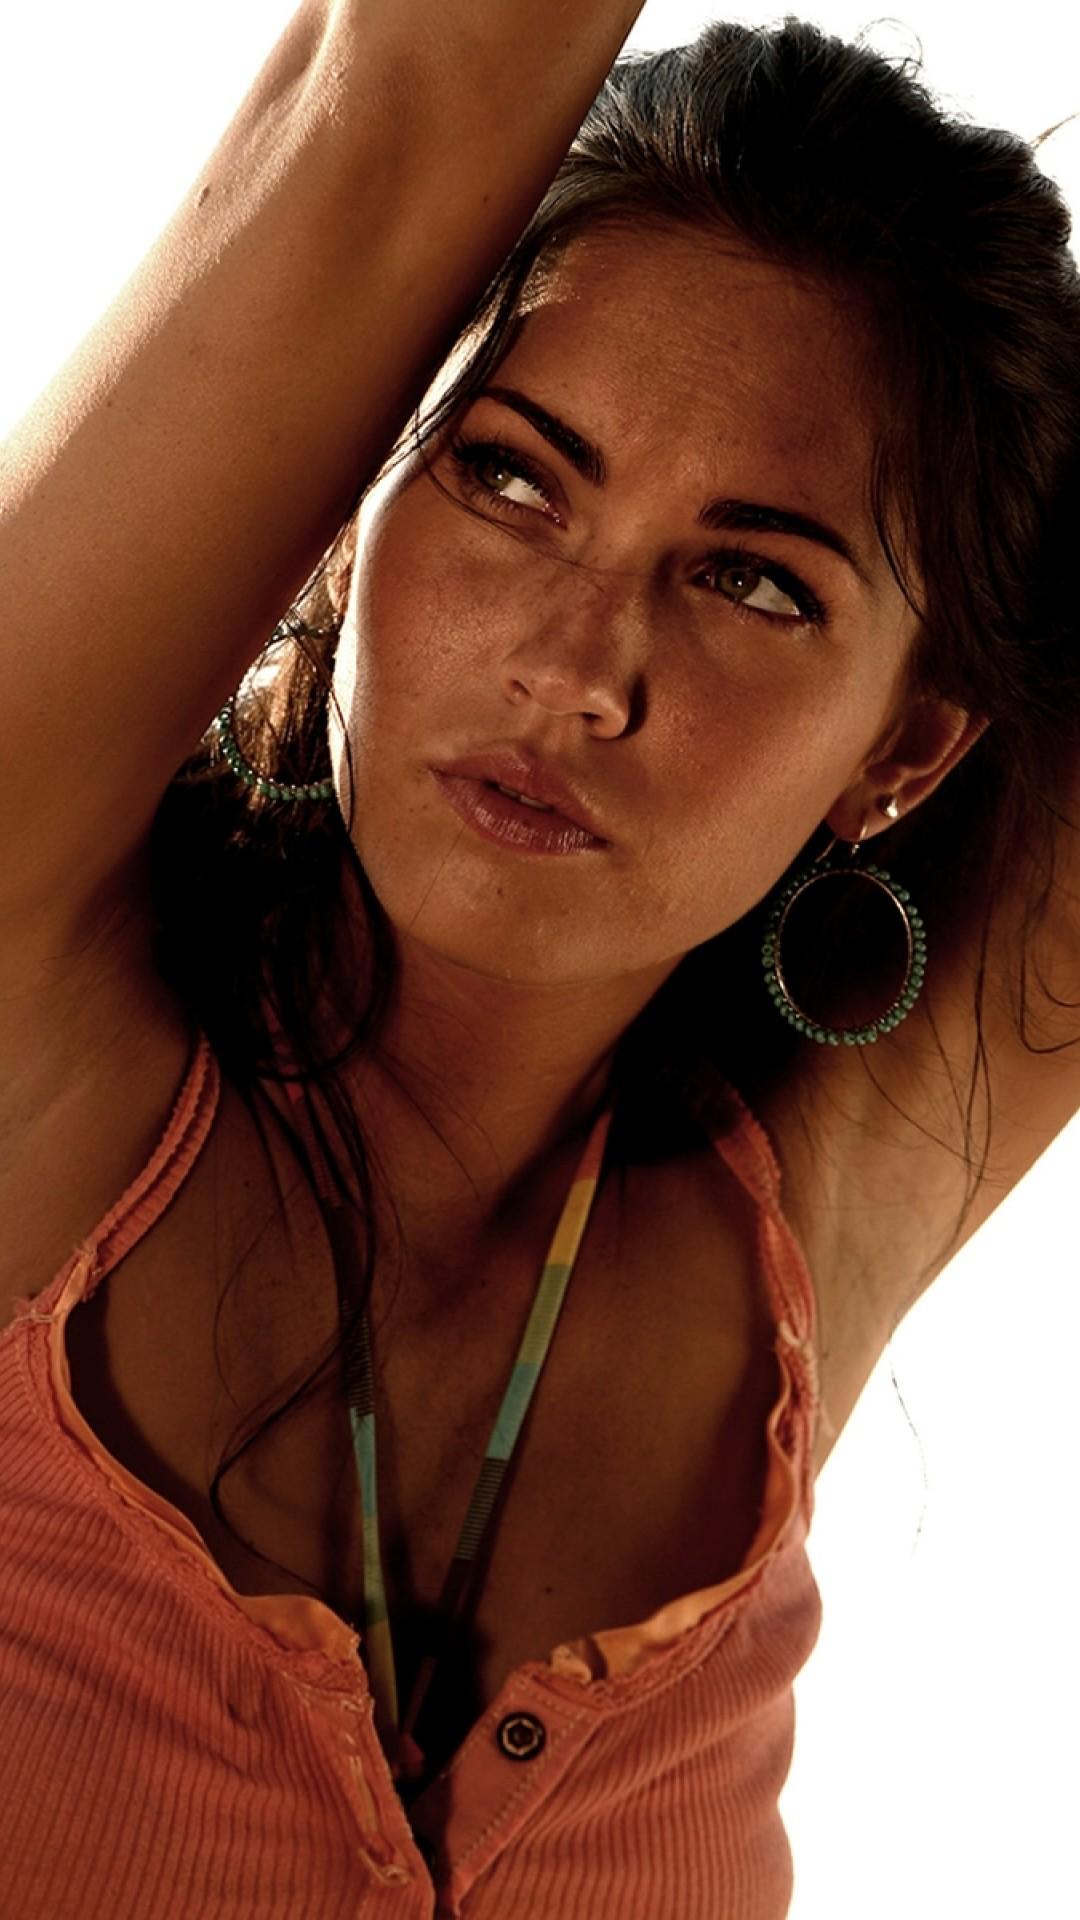 Megan Fox To Be Less Orange Hd Wallpaper Iphone 6 6s Plus